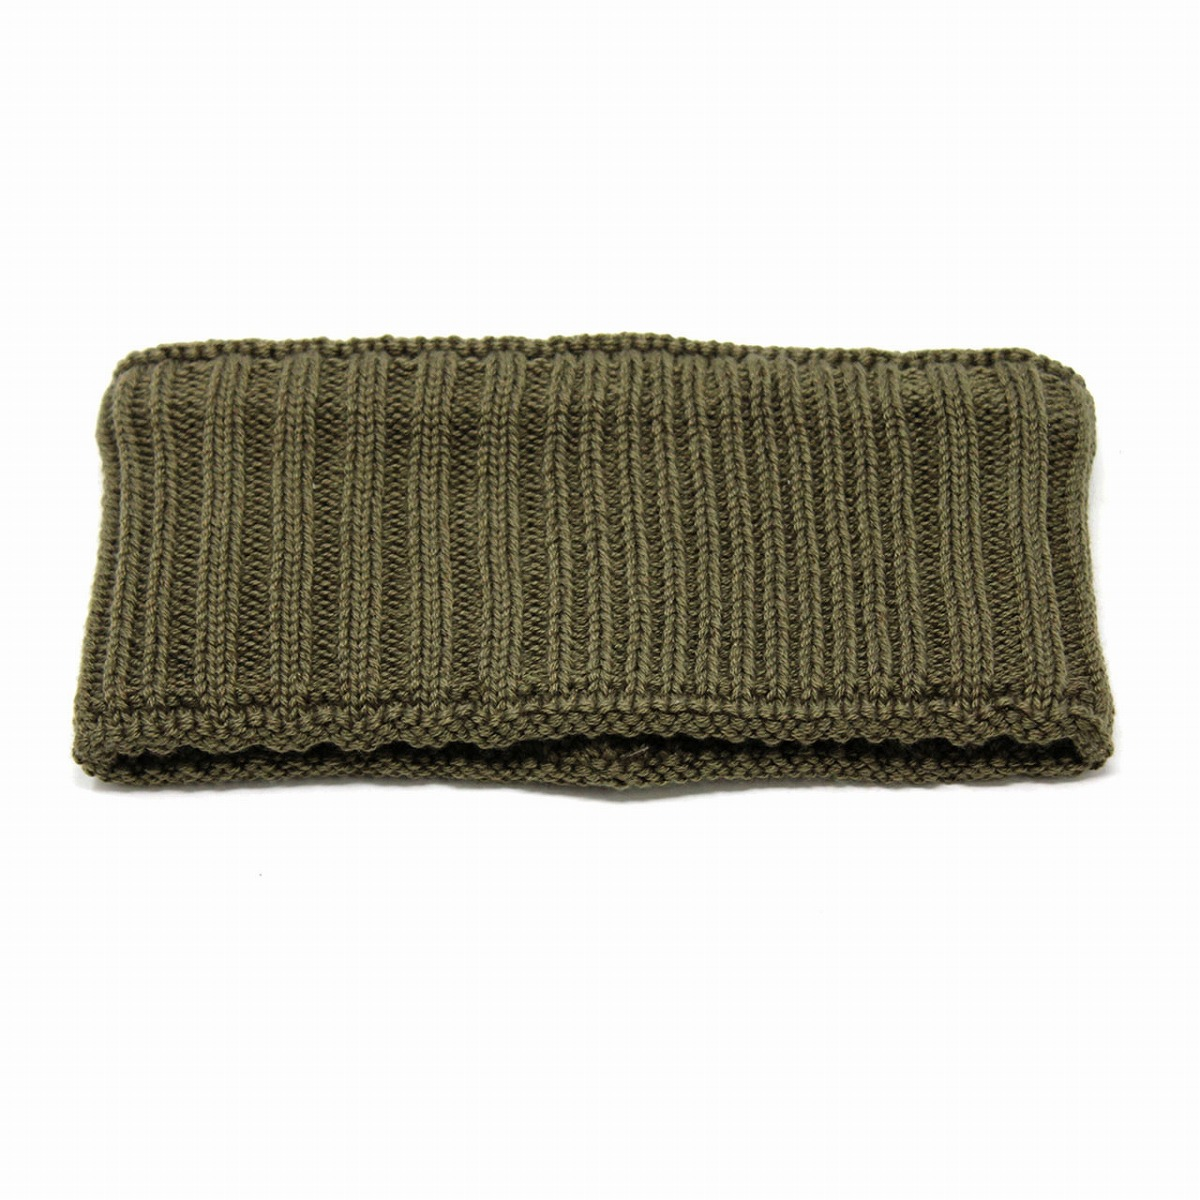 08634ef53583dd racal hat four season headband knit cotton blend adult knit material headband  sports plain fabric Shin ...